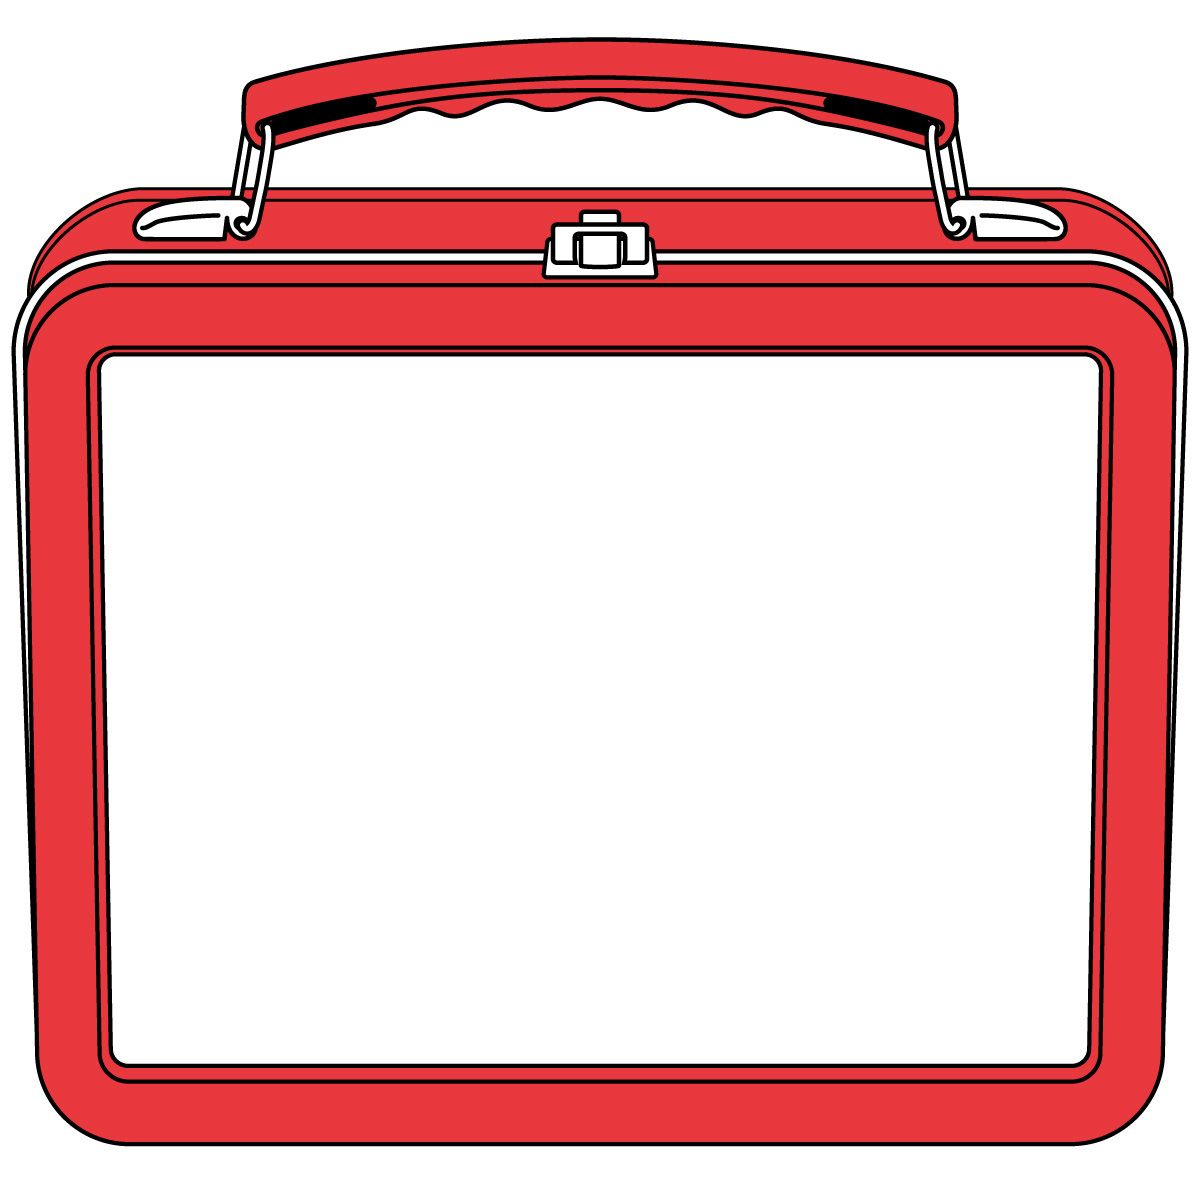 Lunchbox clipart tool box. Lunch clip art school